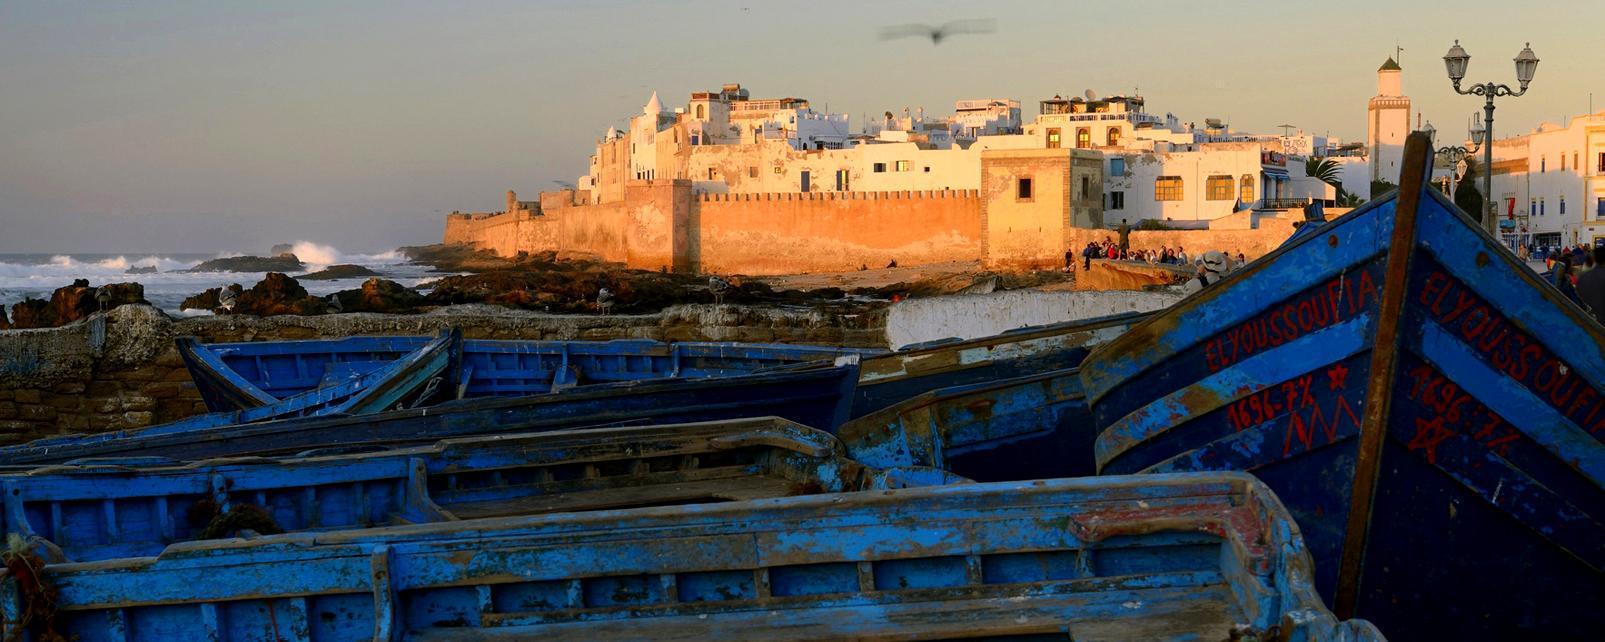 Essaouira quotes